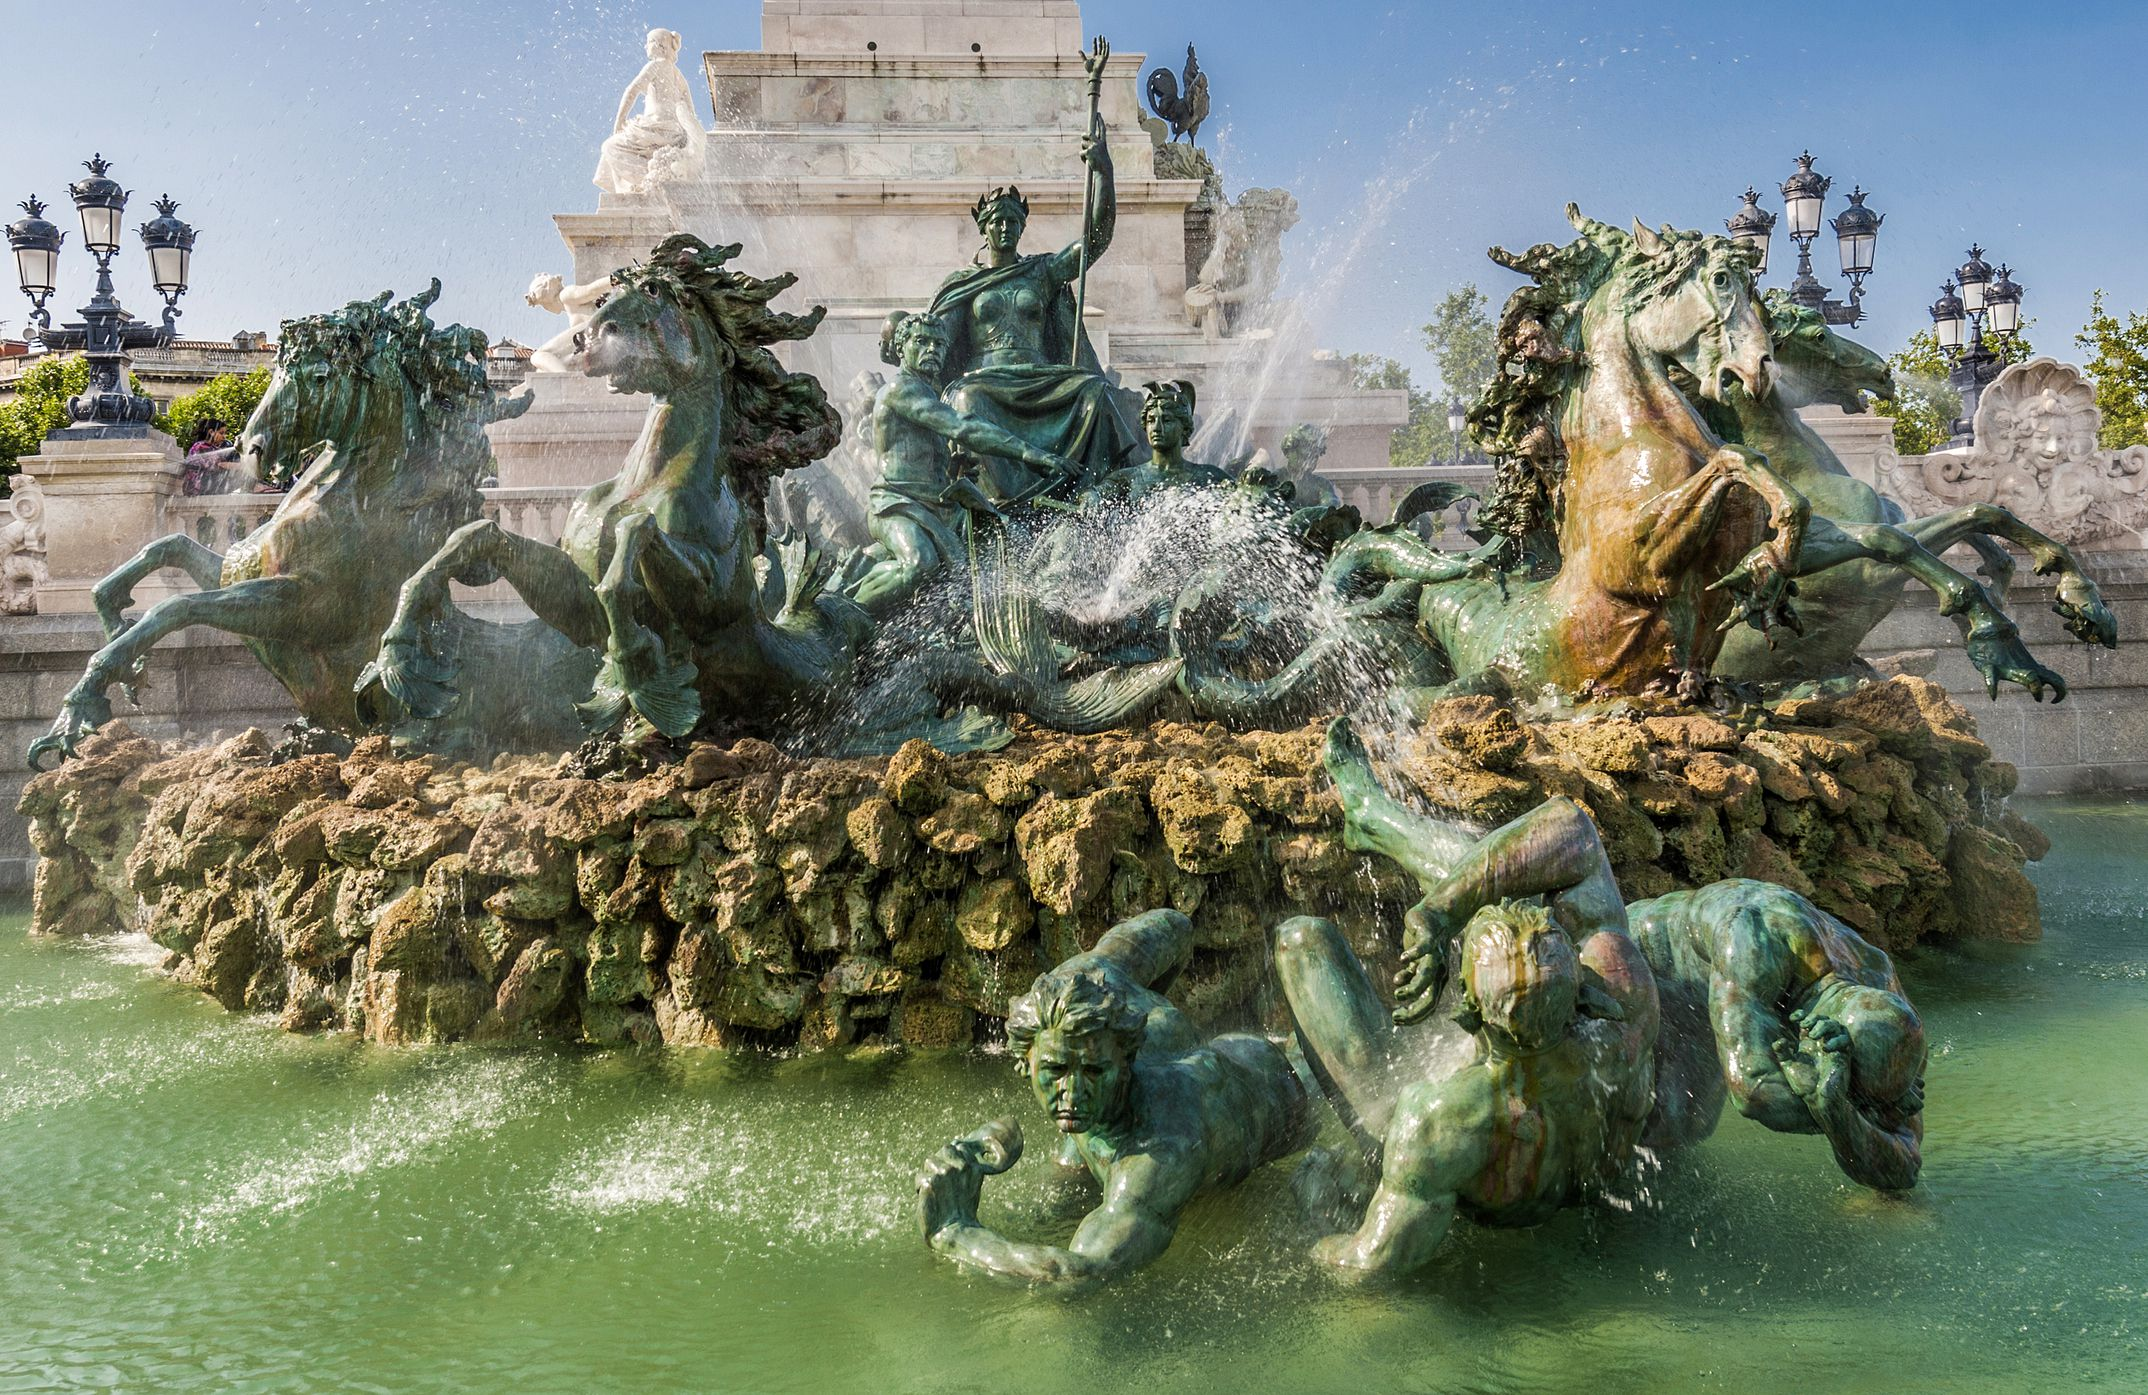 France, Bordeaux, Chartrons neighborhood, Esplanade des Quinconces, fontain of the monument aux Girondins